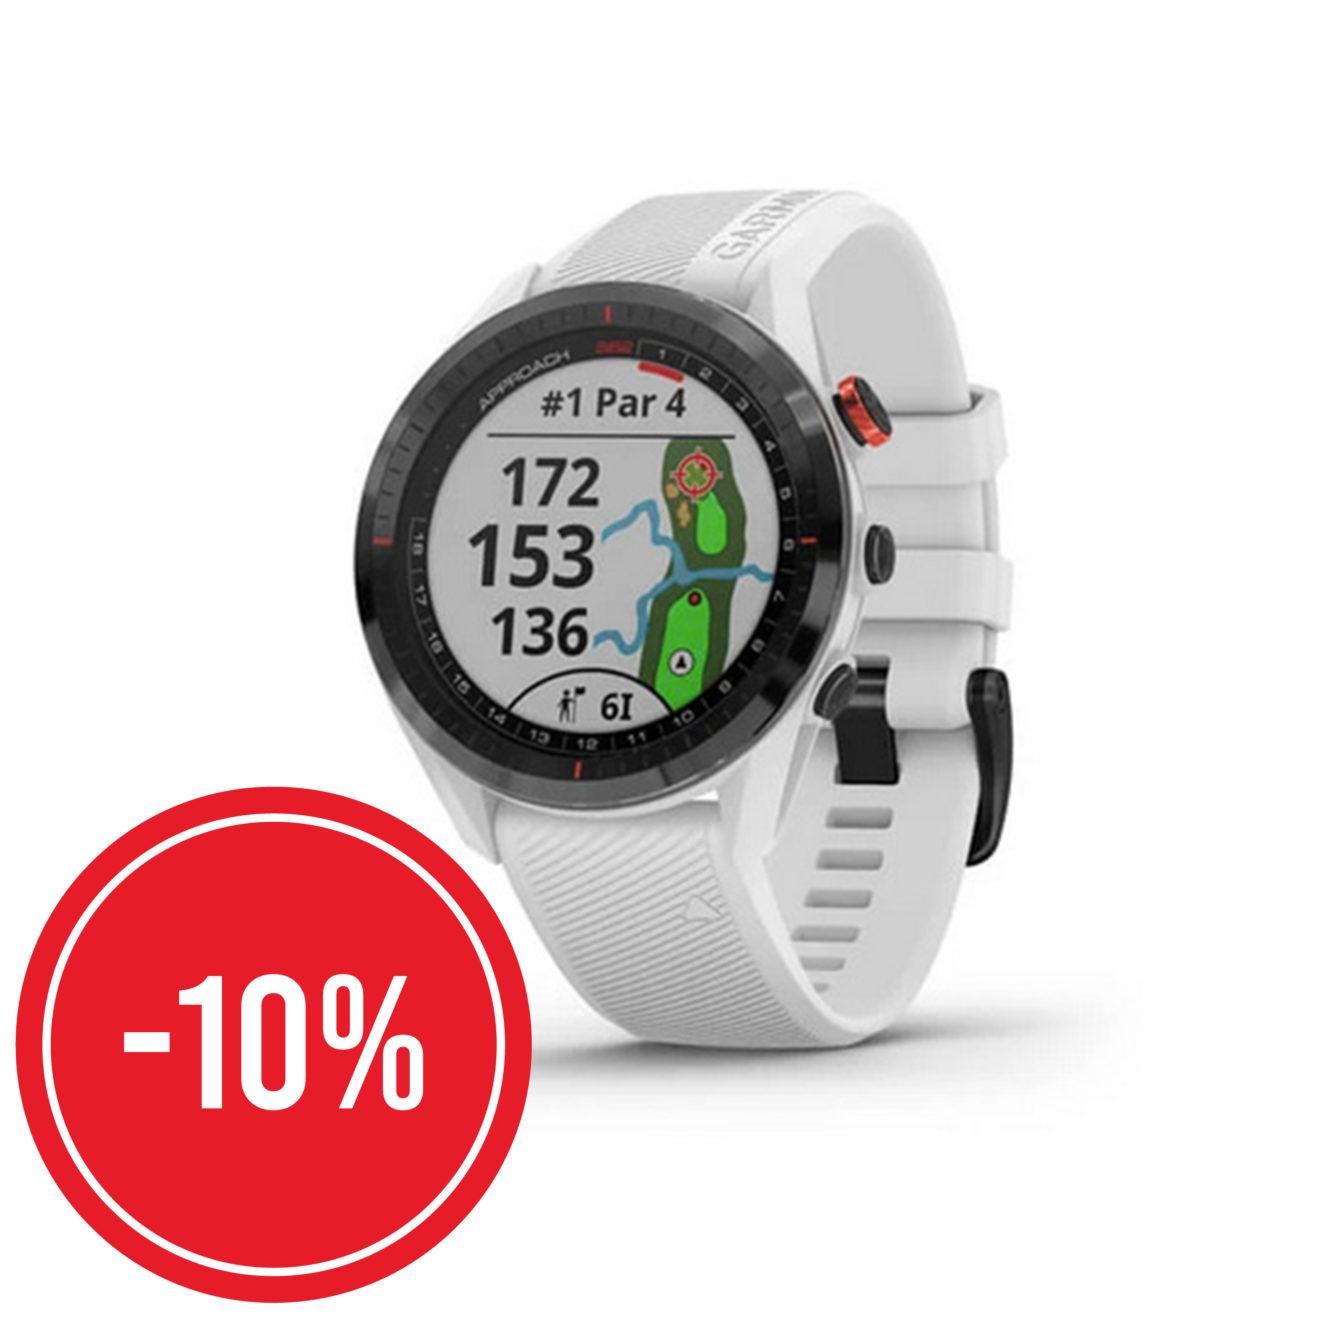 montre-garmin-approach-blanc-10%